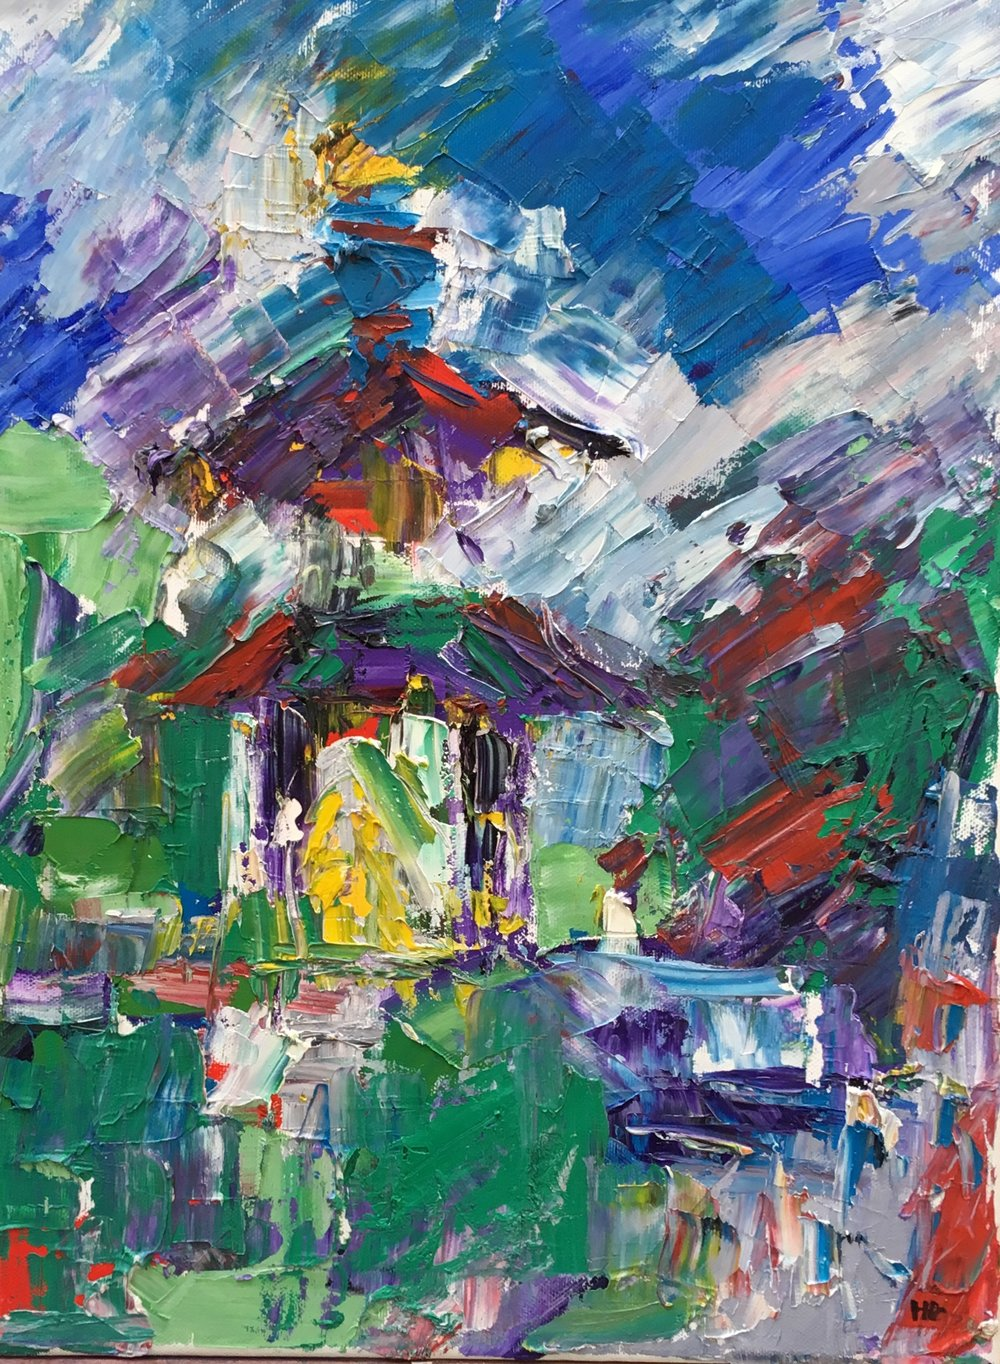 Battersea peace pagoda  oil on canvas  £750  40 by 30 by 1.5 cm  unframed